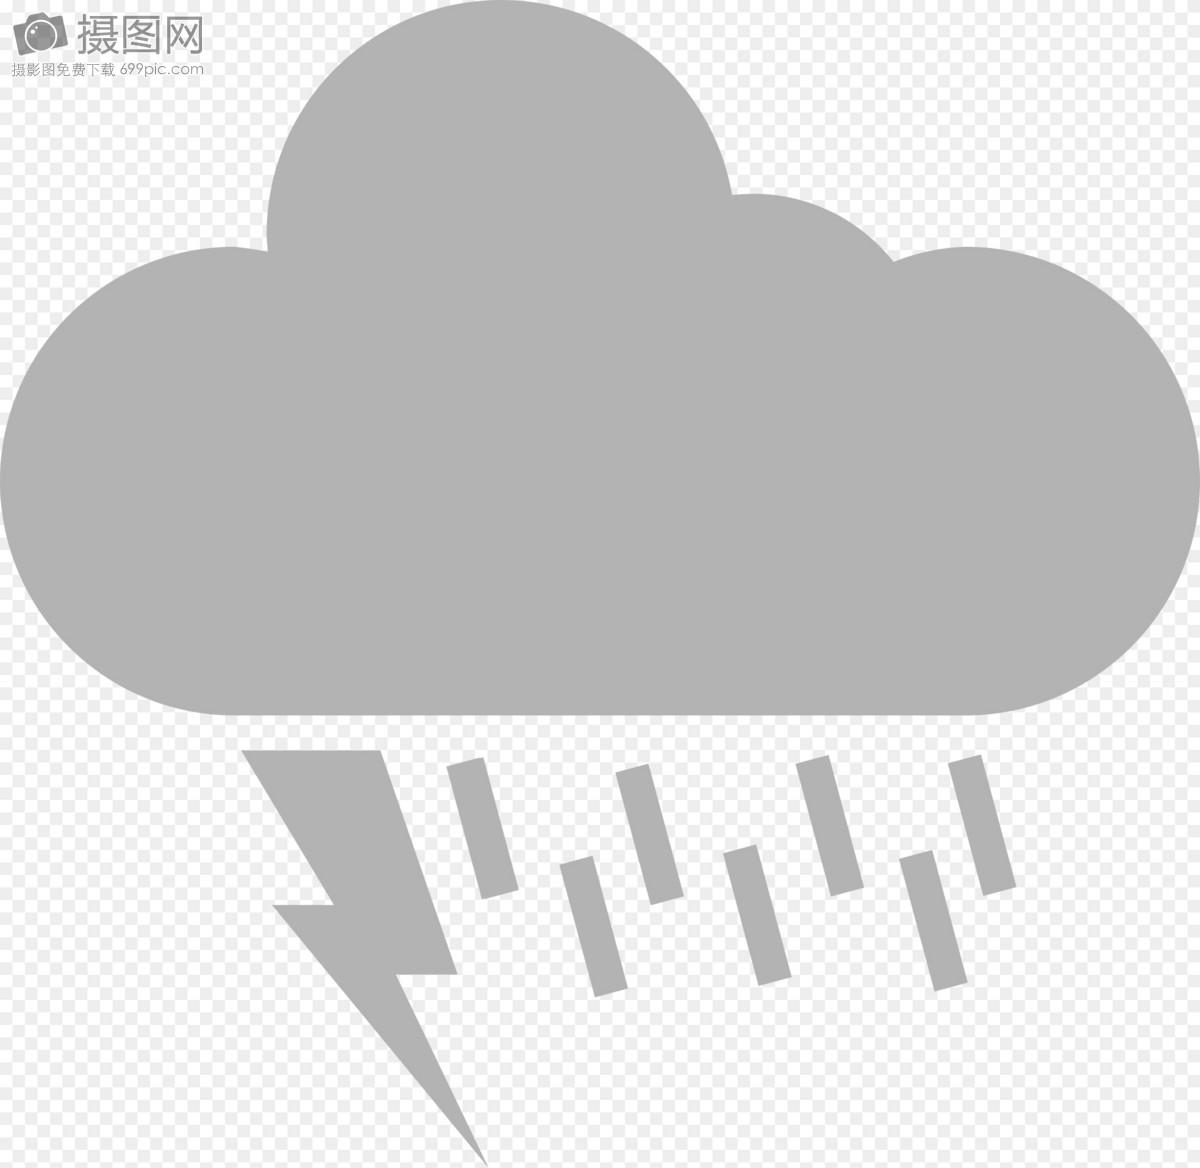 Badai Kilat Gambar Unduh Gratisimej 400044315format Svgmylovepikcom